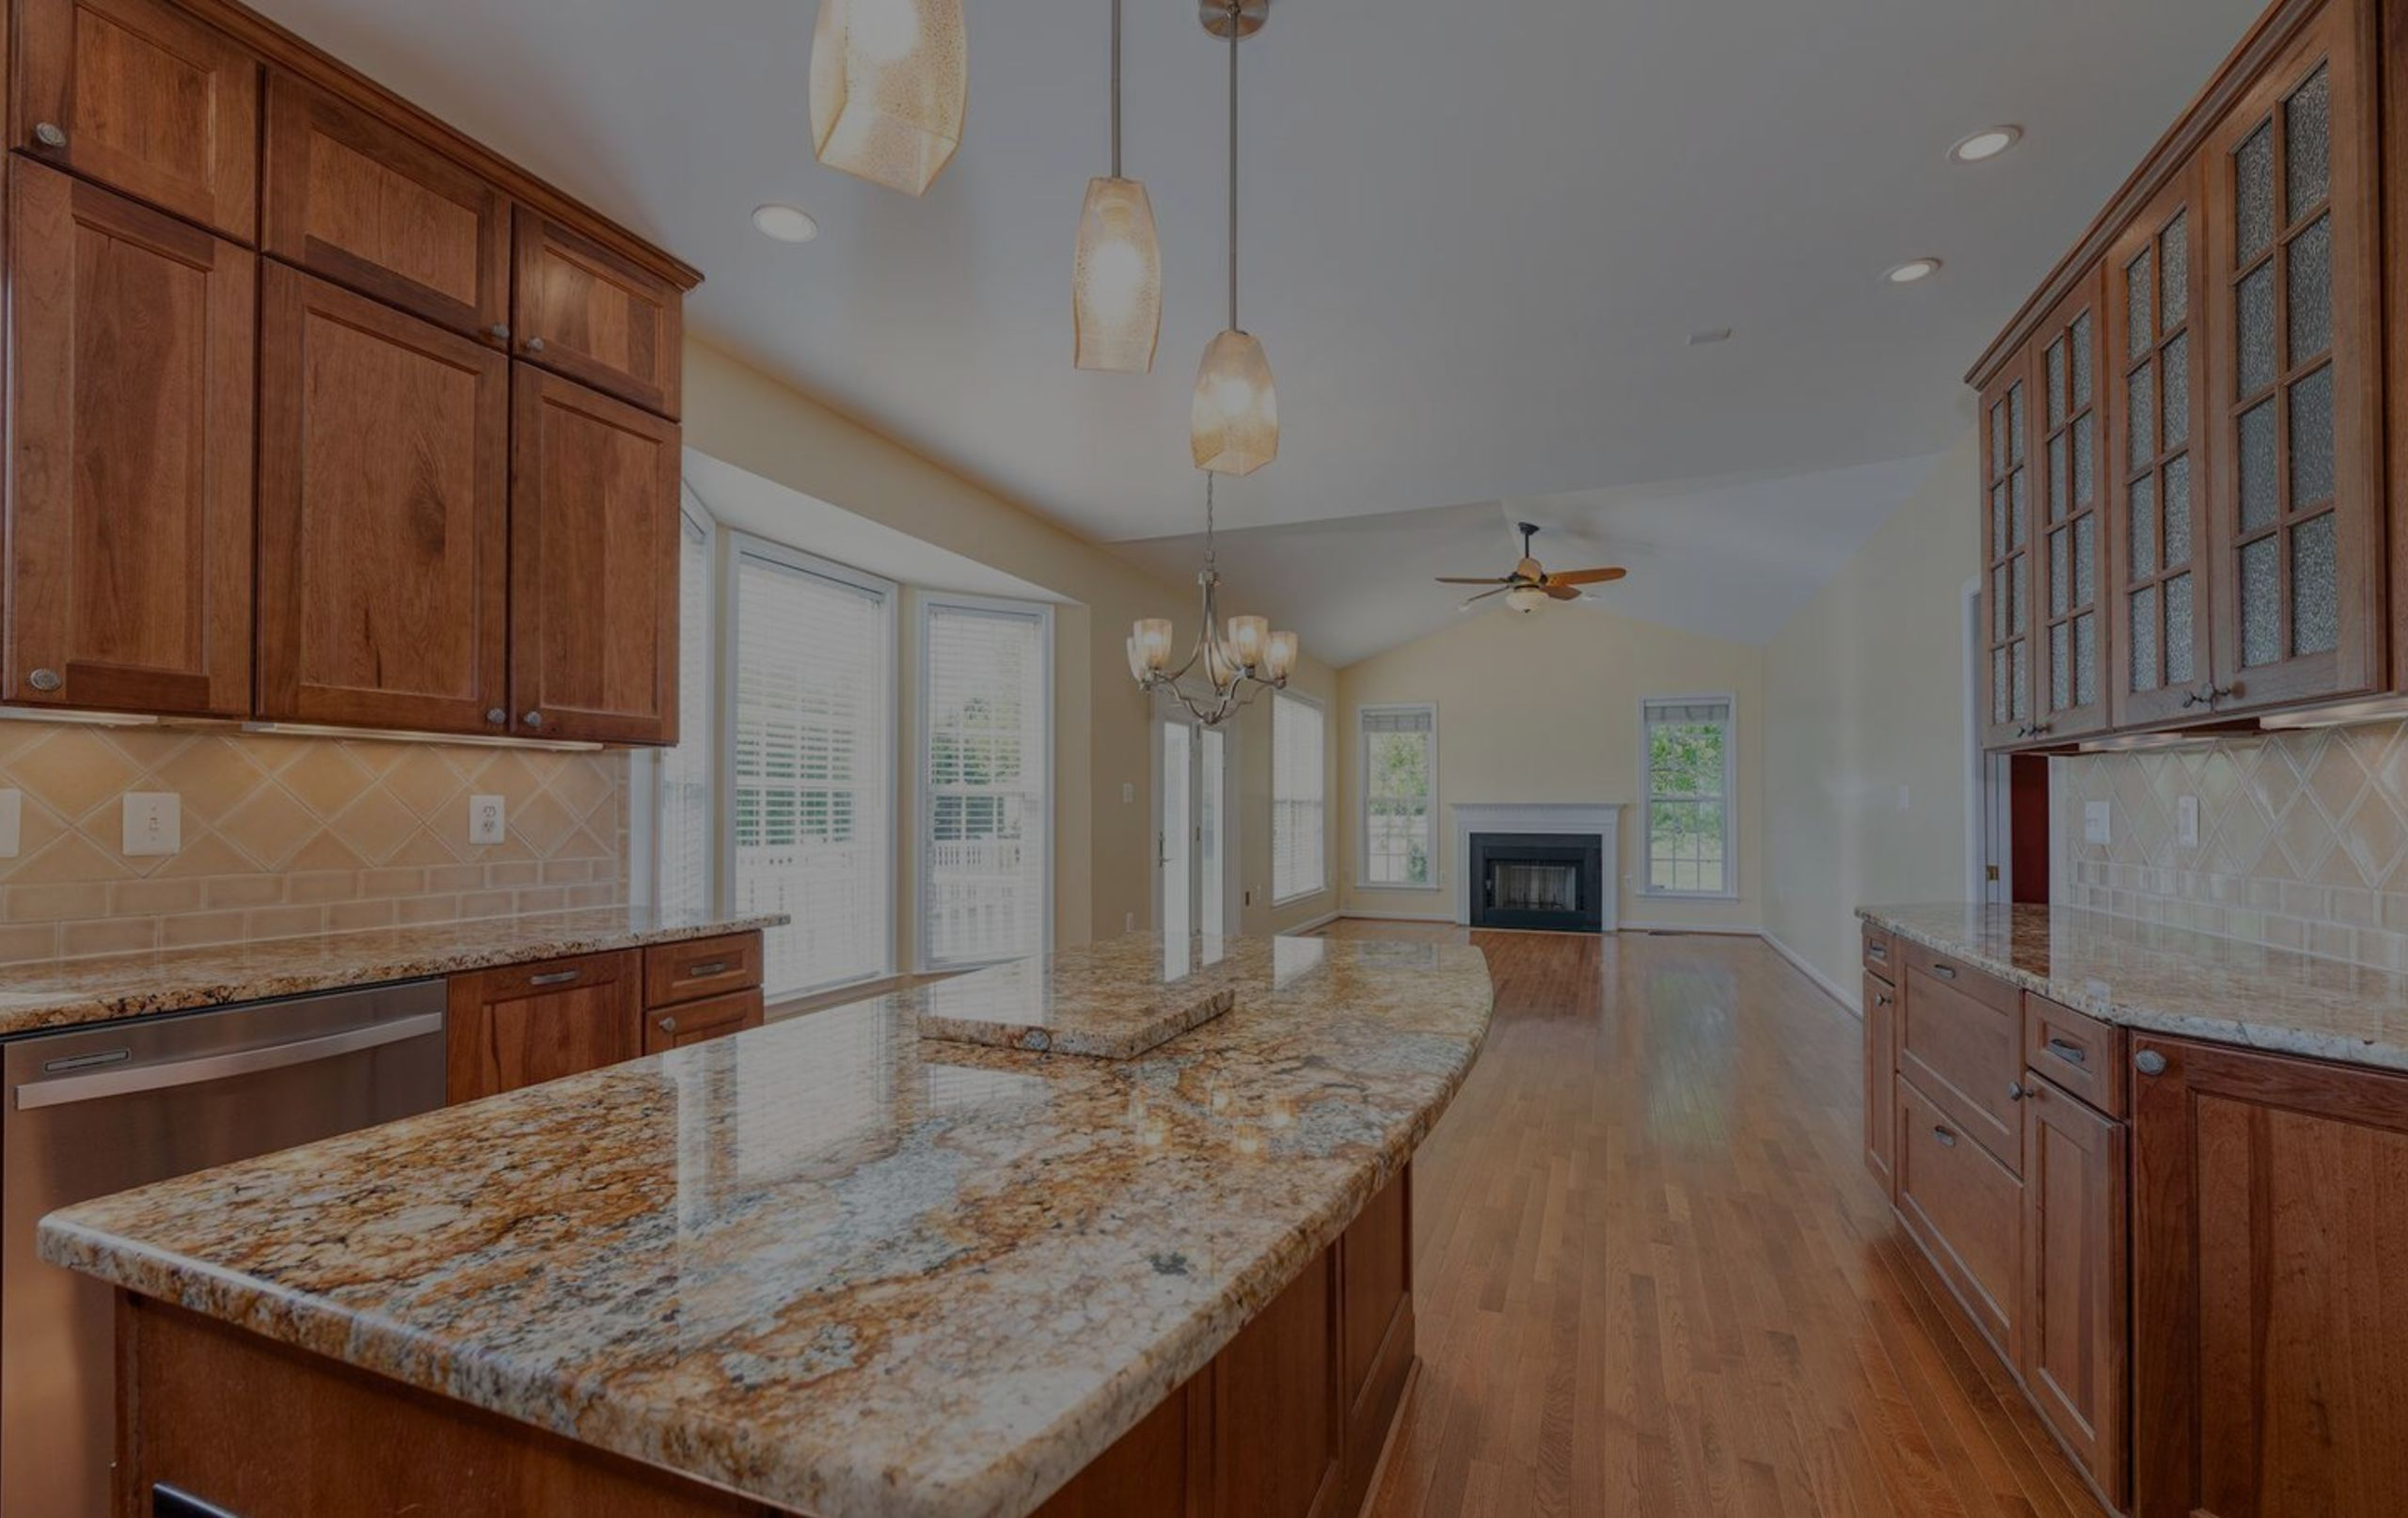 Open Houses | 6/1-2 in Fairfax, Fauquier & Loudoun